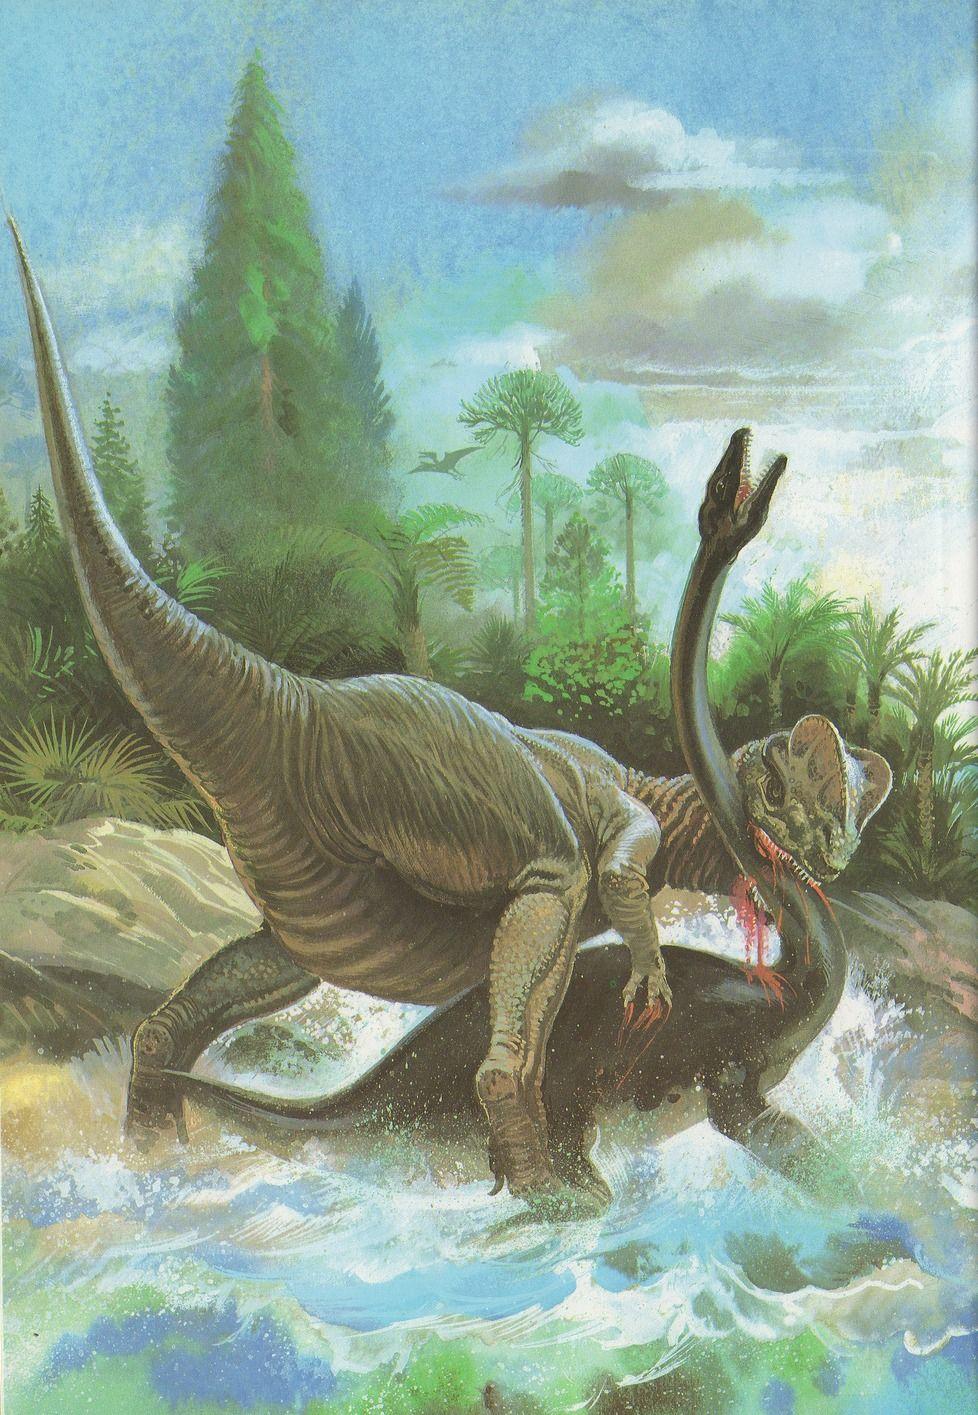 Dilophosaurus and Plesiosaur by Andrew Howatt | Dinosaurs ...